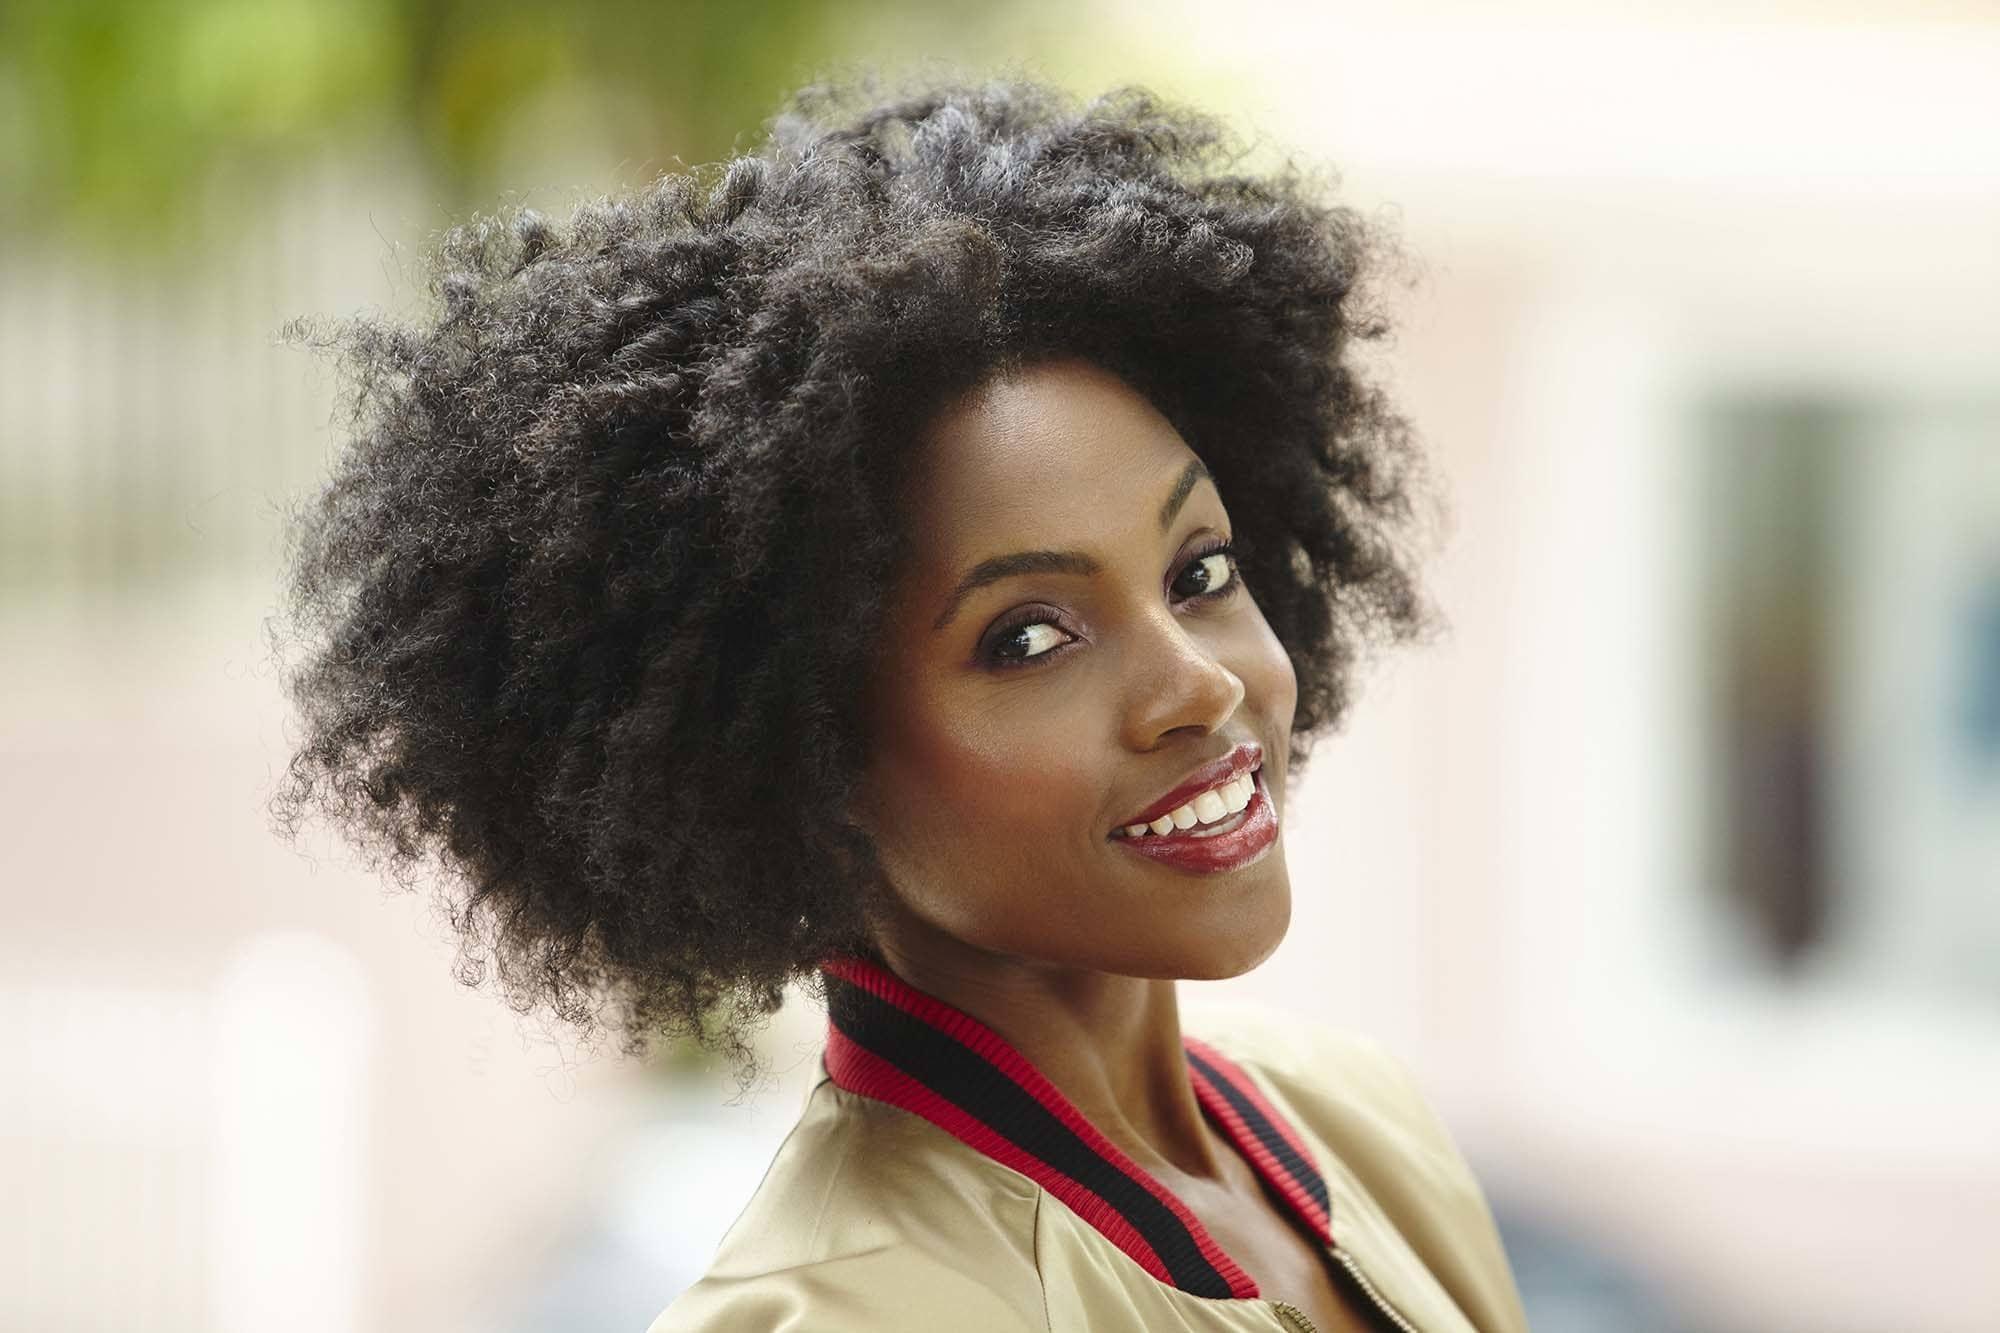 cabelo afro curto com volume